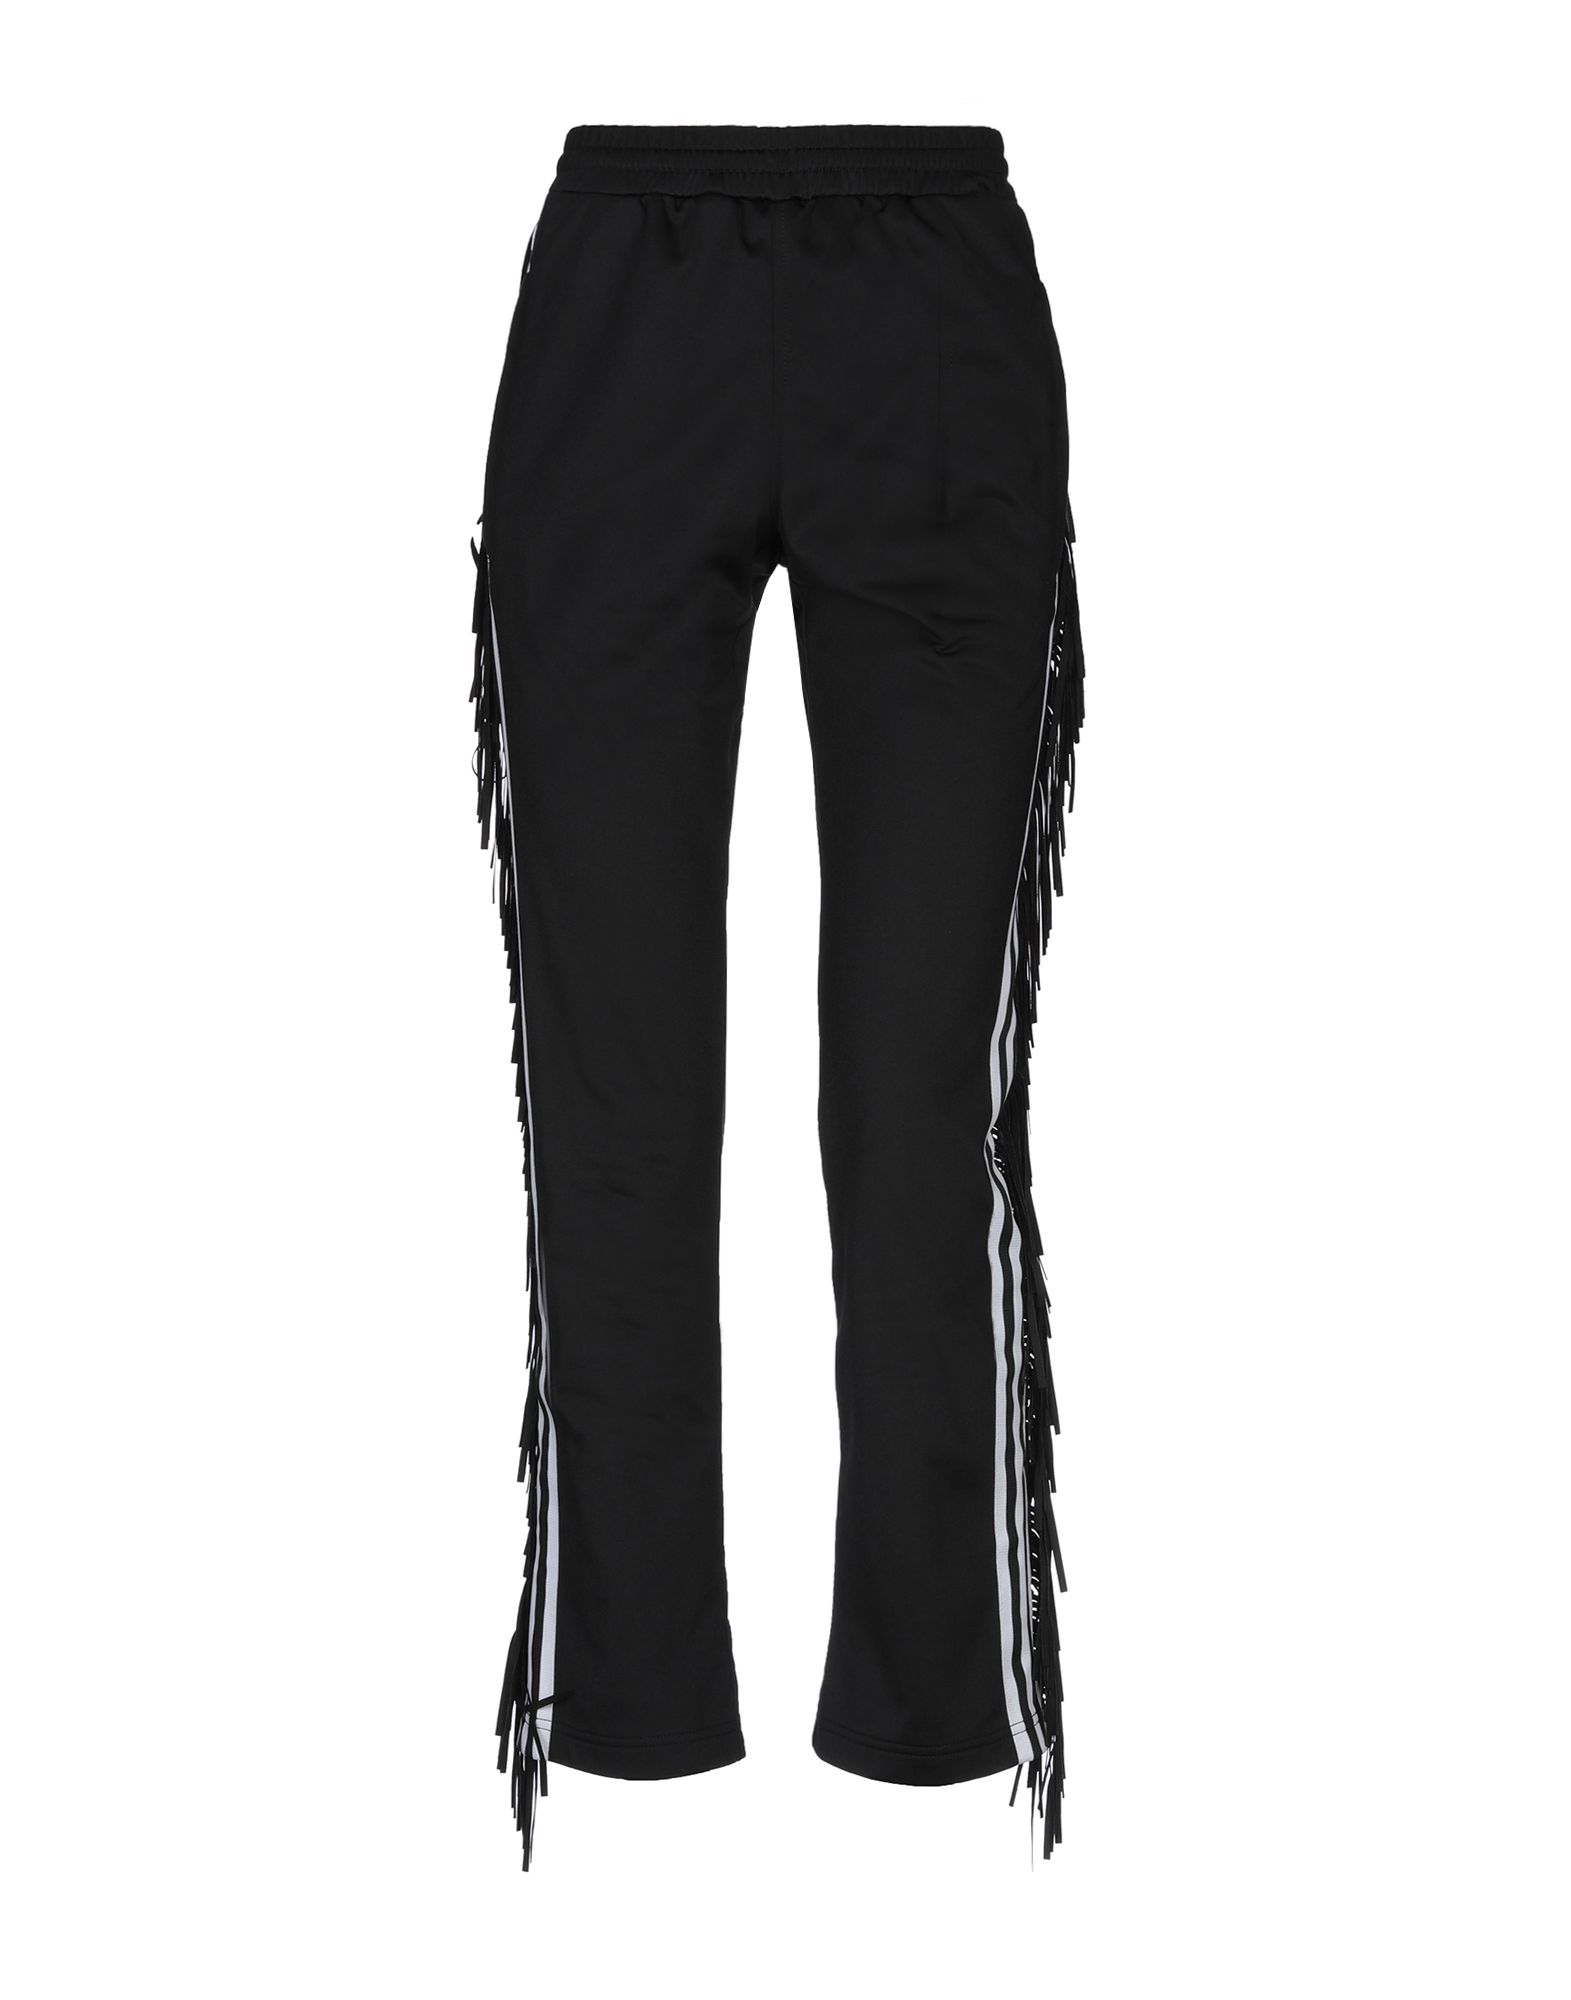 ADIDAS ORIGINALS by JEREMY SCOTT Повседневные брюки adidas originals by jeremy scott низкие кеды и кроссовки